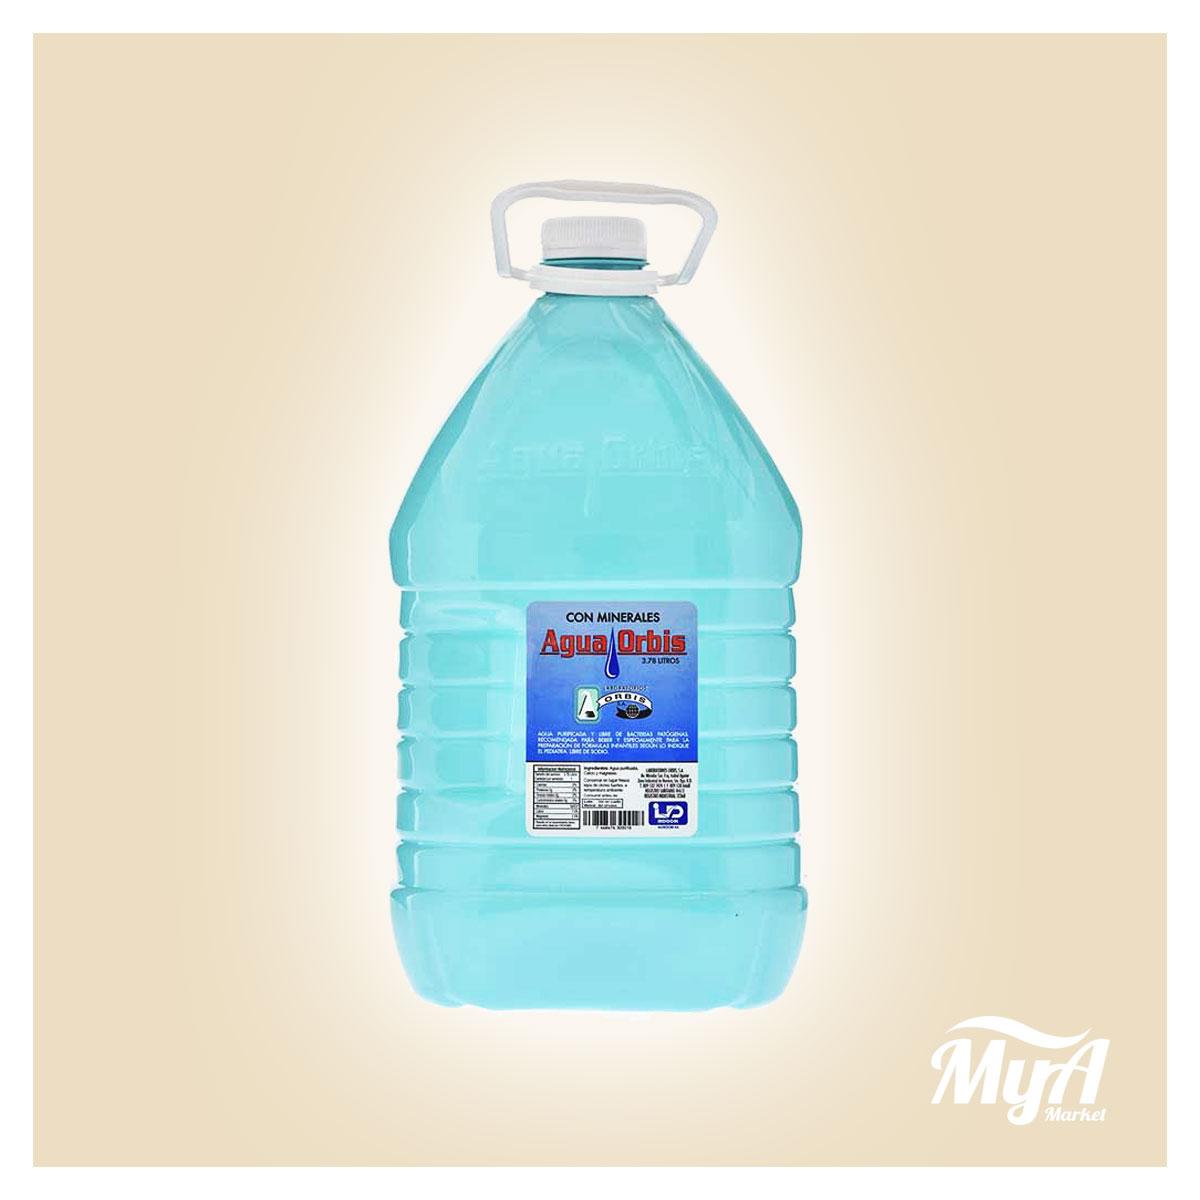 Agua Orbis Tapa Blanca 5lt